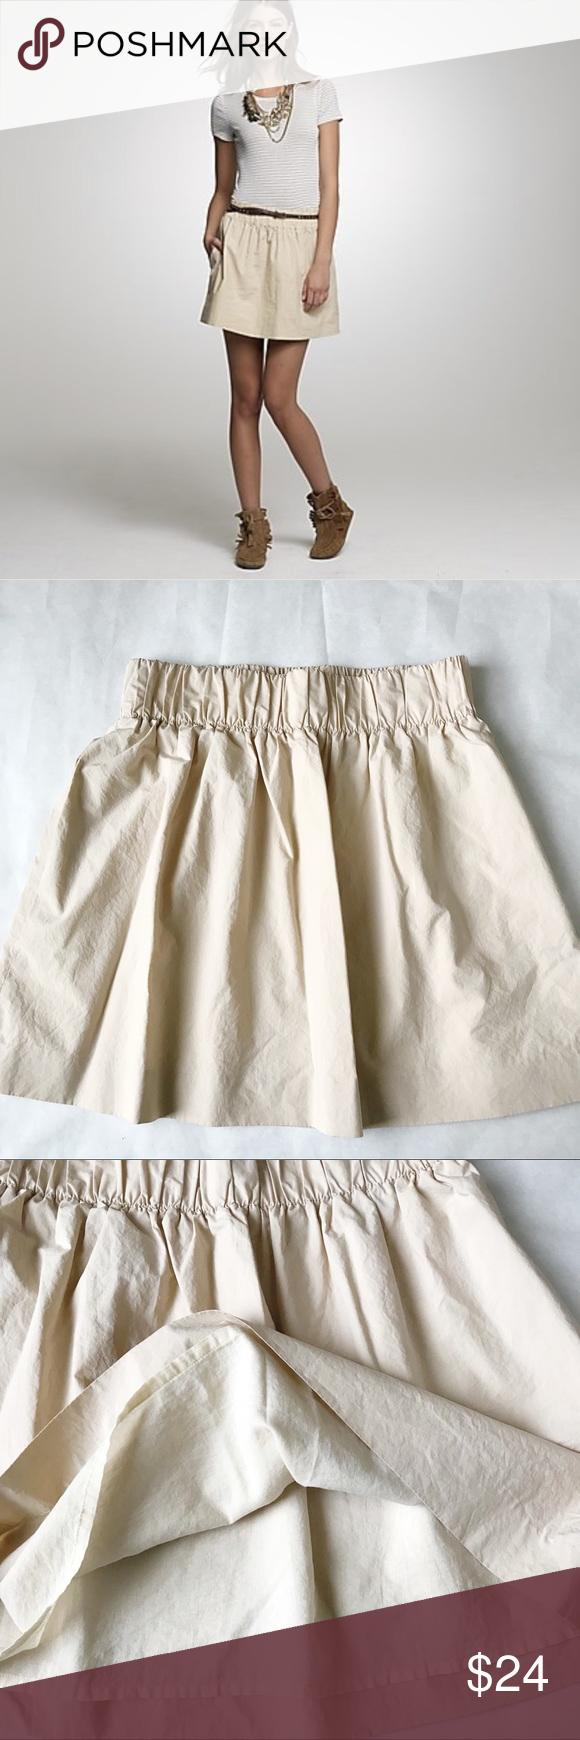 J Crew Poplin Wednesday Skirt J. Crew Poplin Wednesday Skirt  Size: 2 Color: Beige Fabric: 100% Cott...